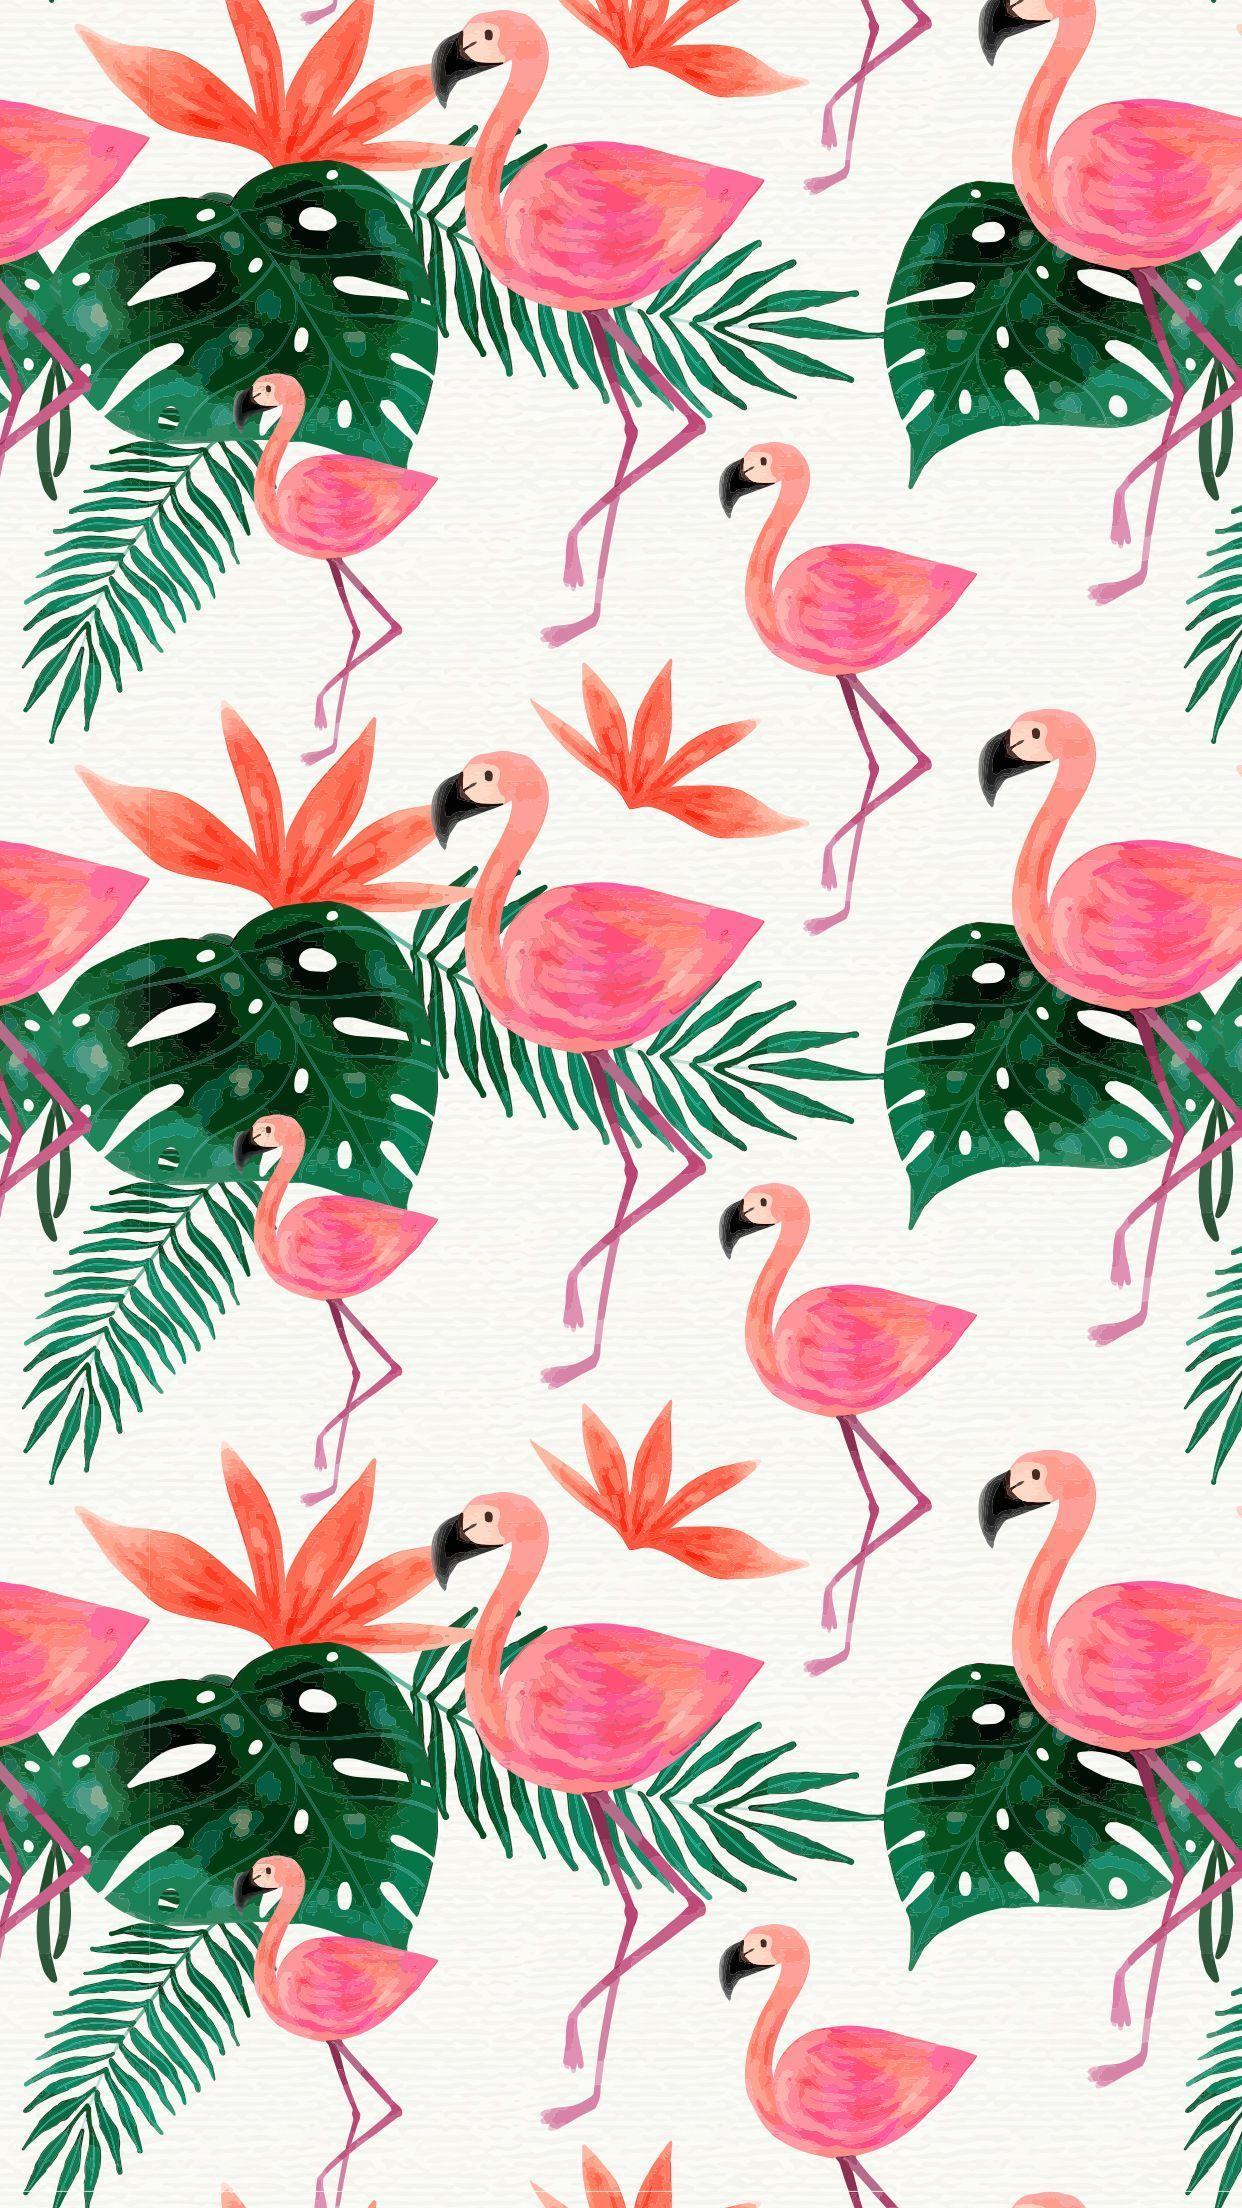 Tropical Flamingo Phone Wallpapers Top Free Tropical